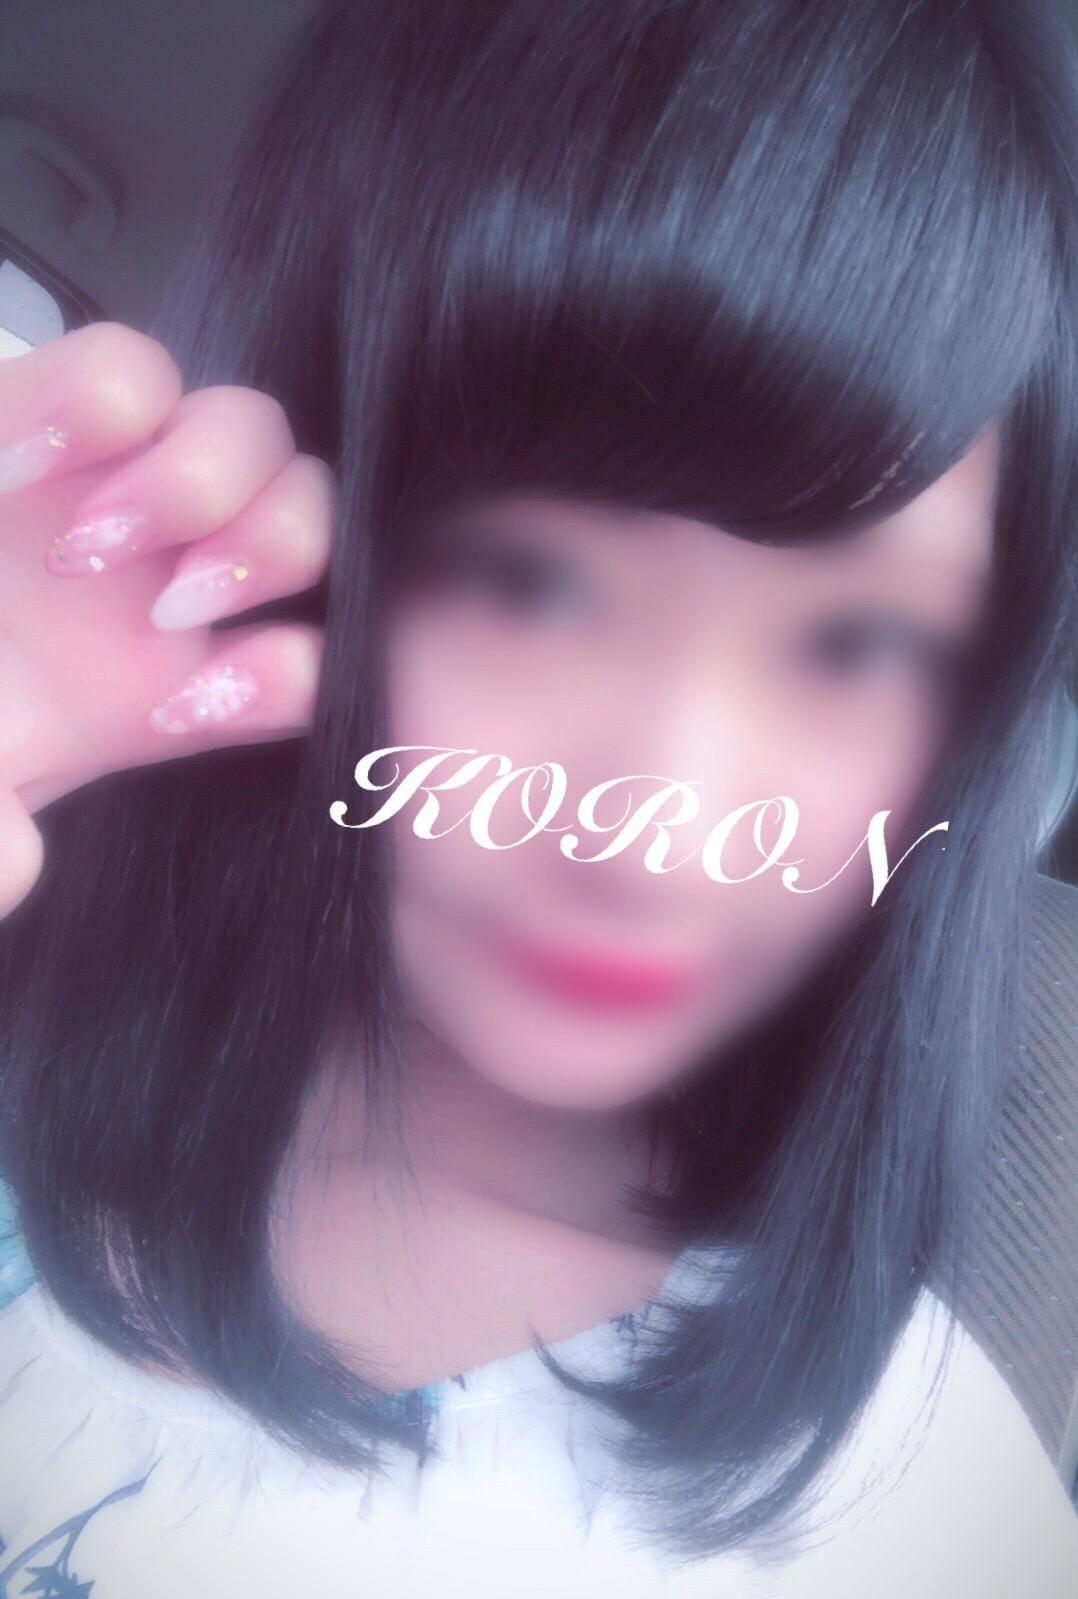 「*KORON*」06/12(06/12) 14:28 | ころんの写メ・風俗動画